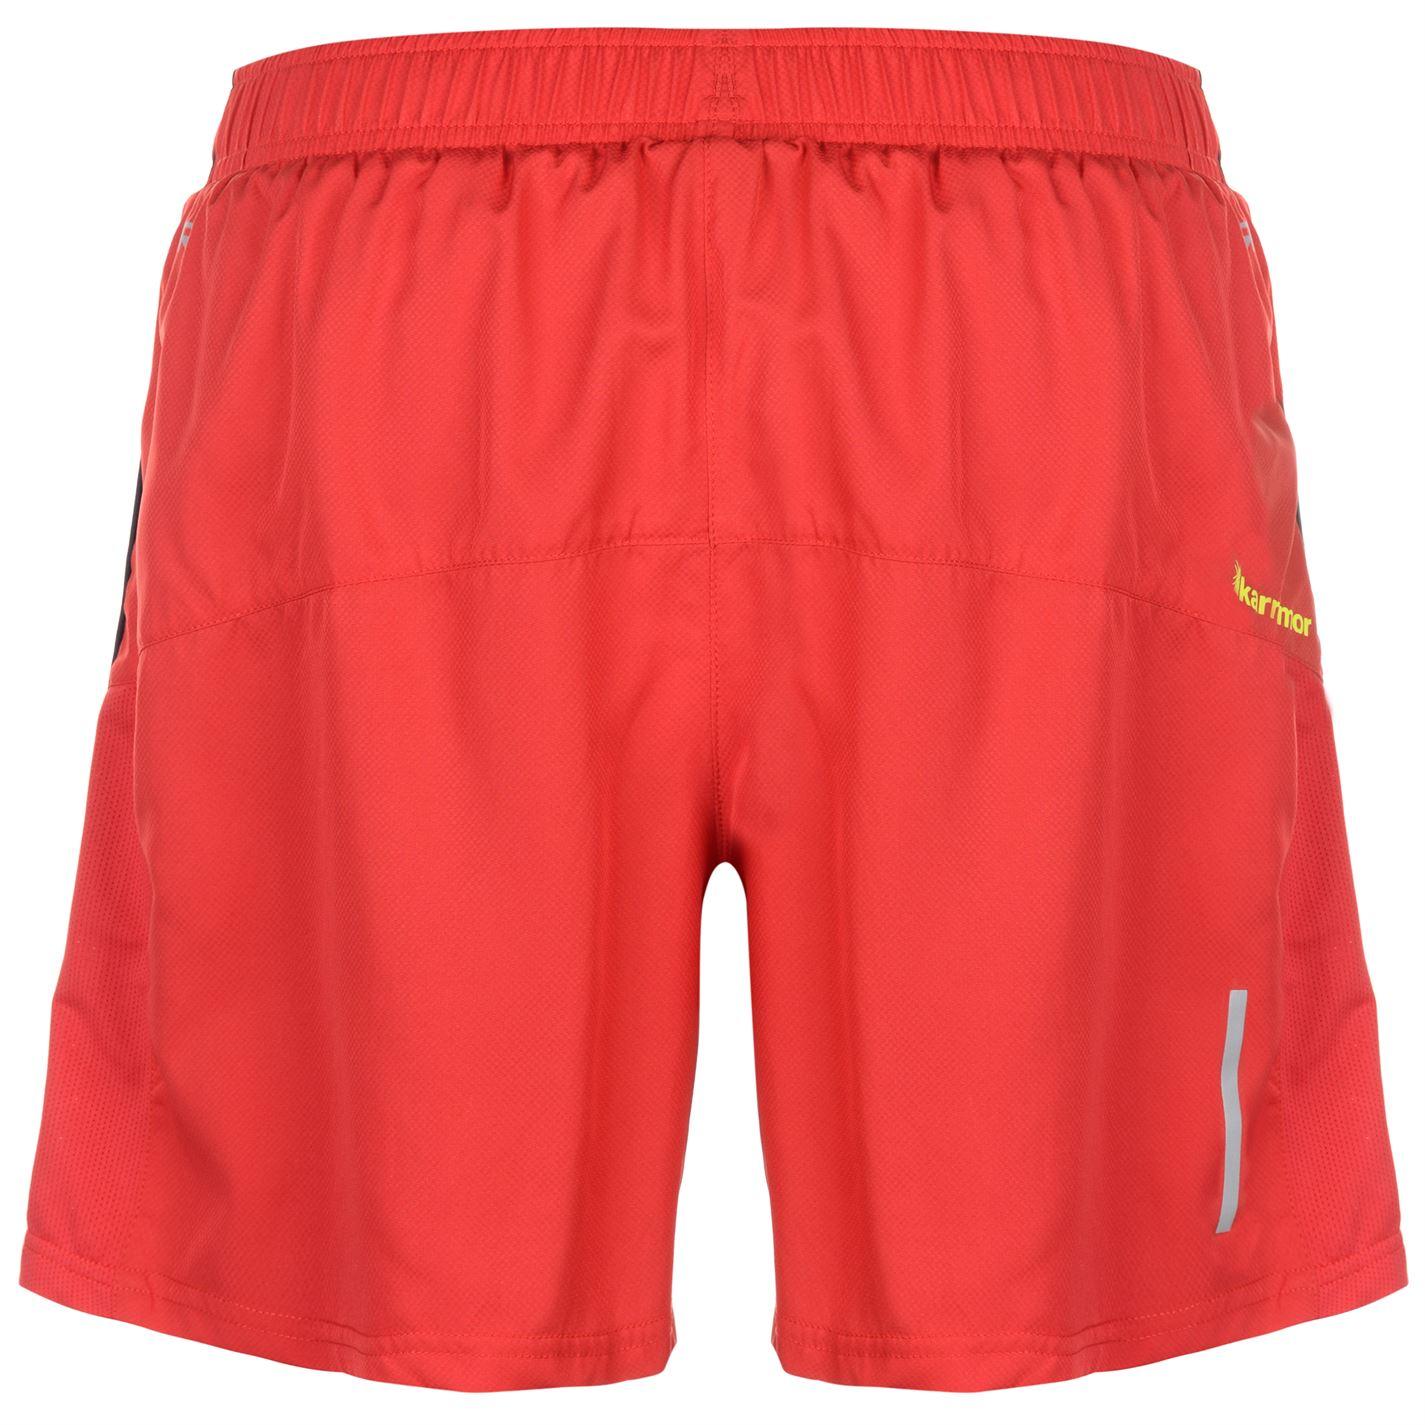 Karrimor-Xlite-5inch-Running-Shorts-Performance-Mens thumbnail 21